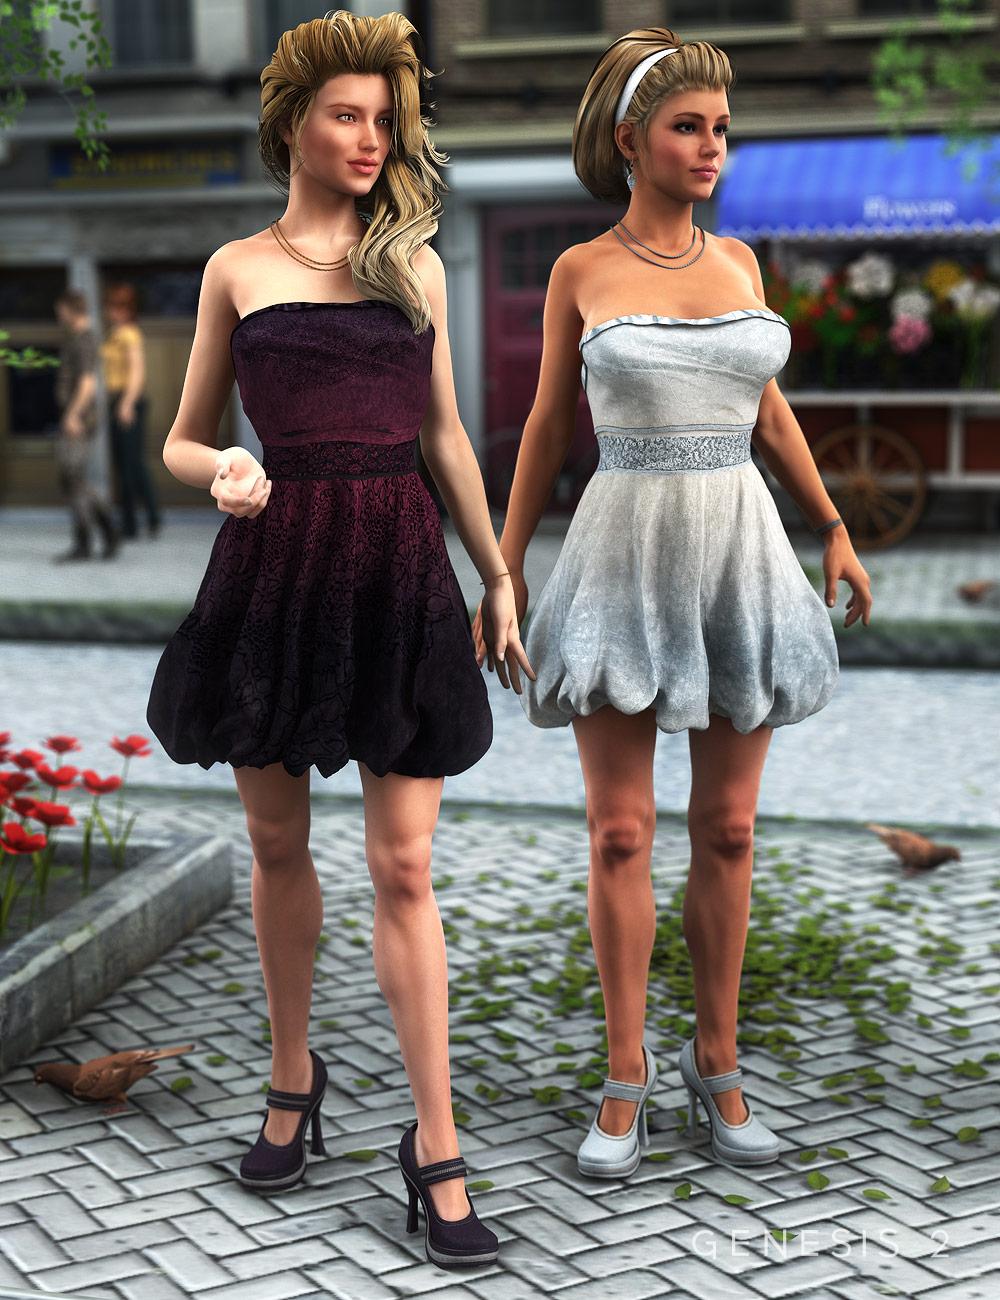 Stylish Bubble Dress Textures by: Sarsa, 3D Models by Daz 3D